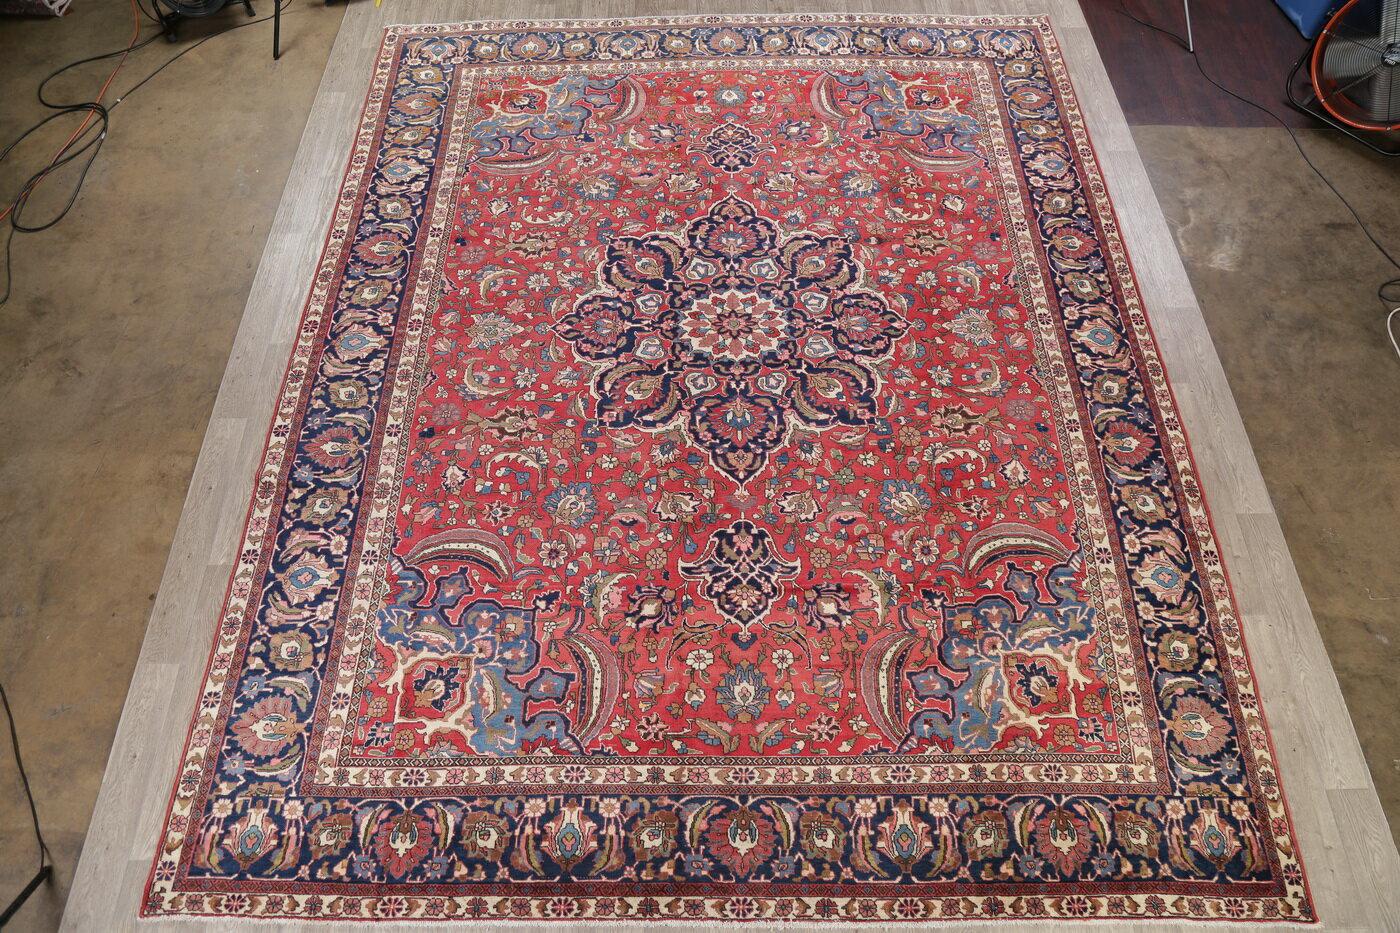 Rugsource Rugsource Antique Vegetable Dye Bakhtiari